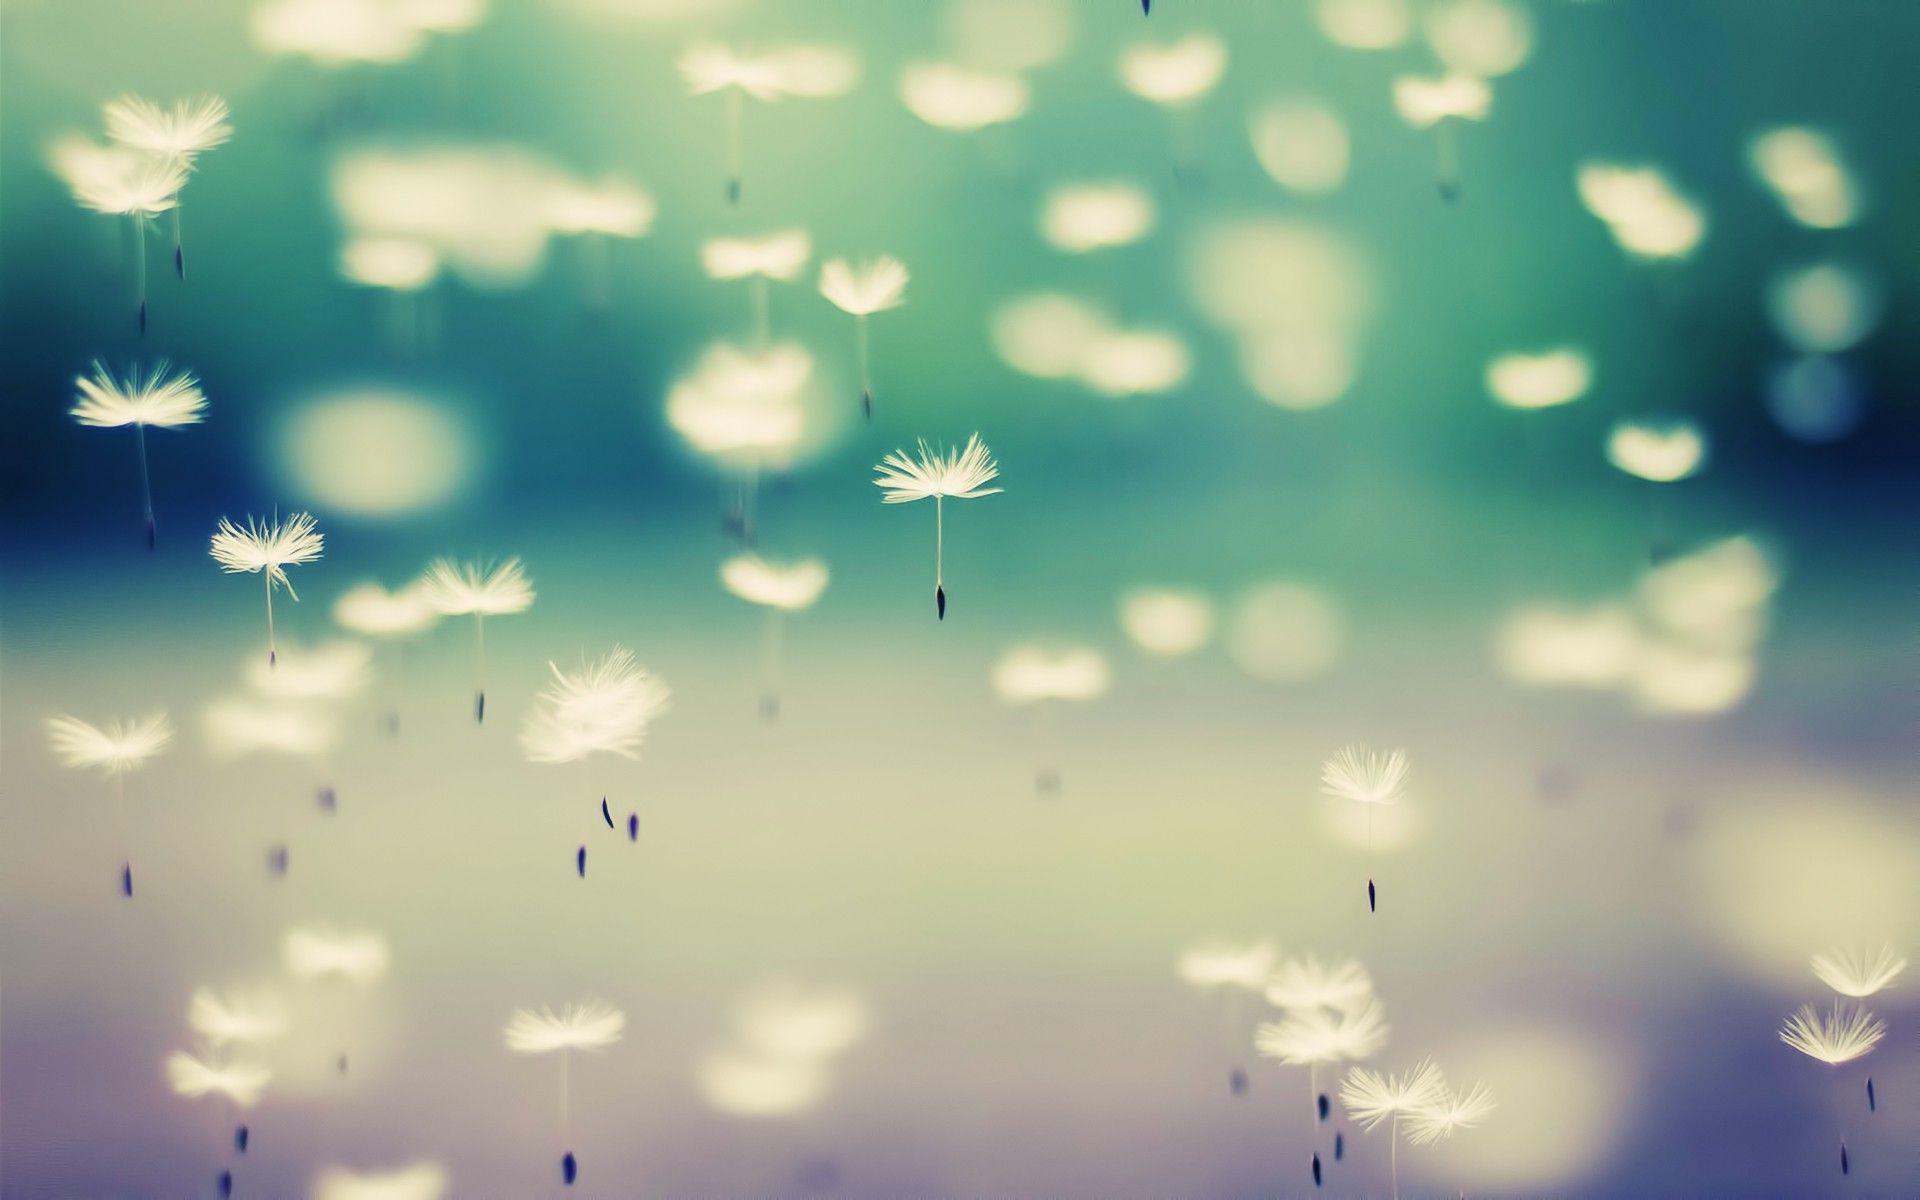 Dandelion Backgrounds - WallpaperSafari